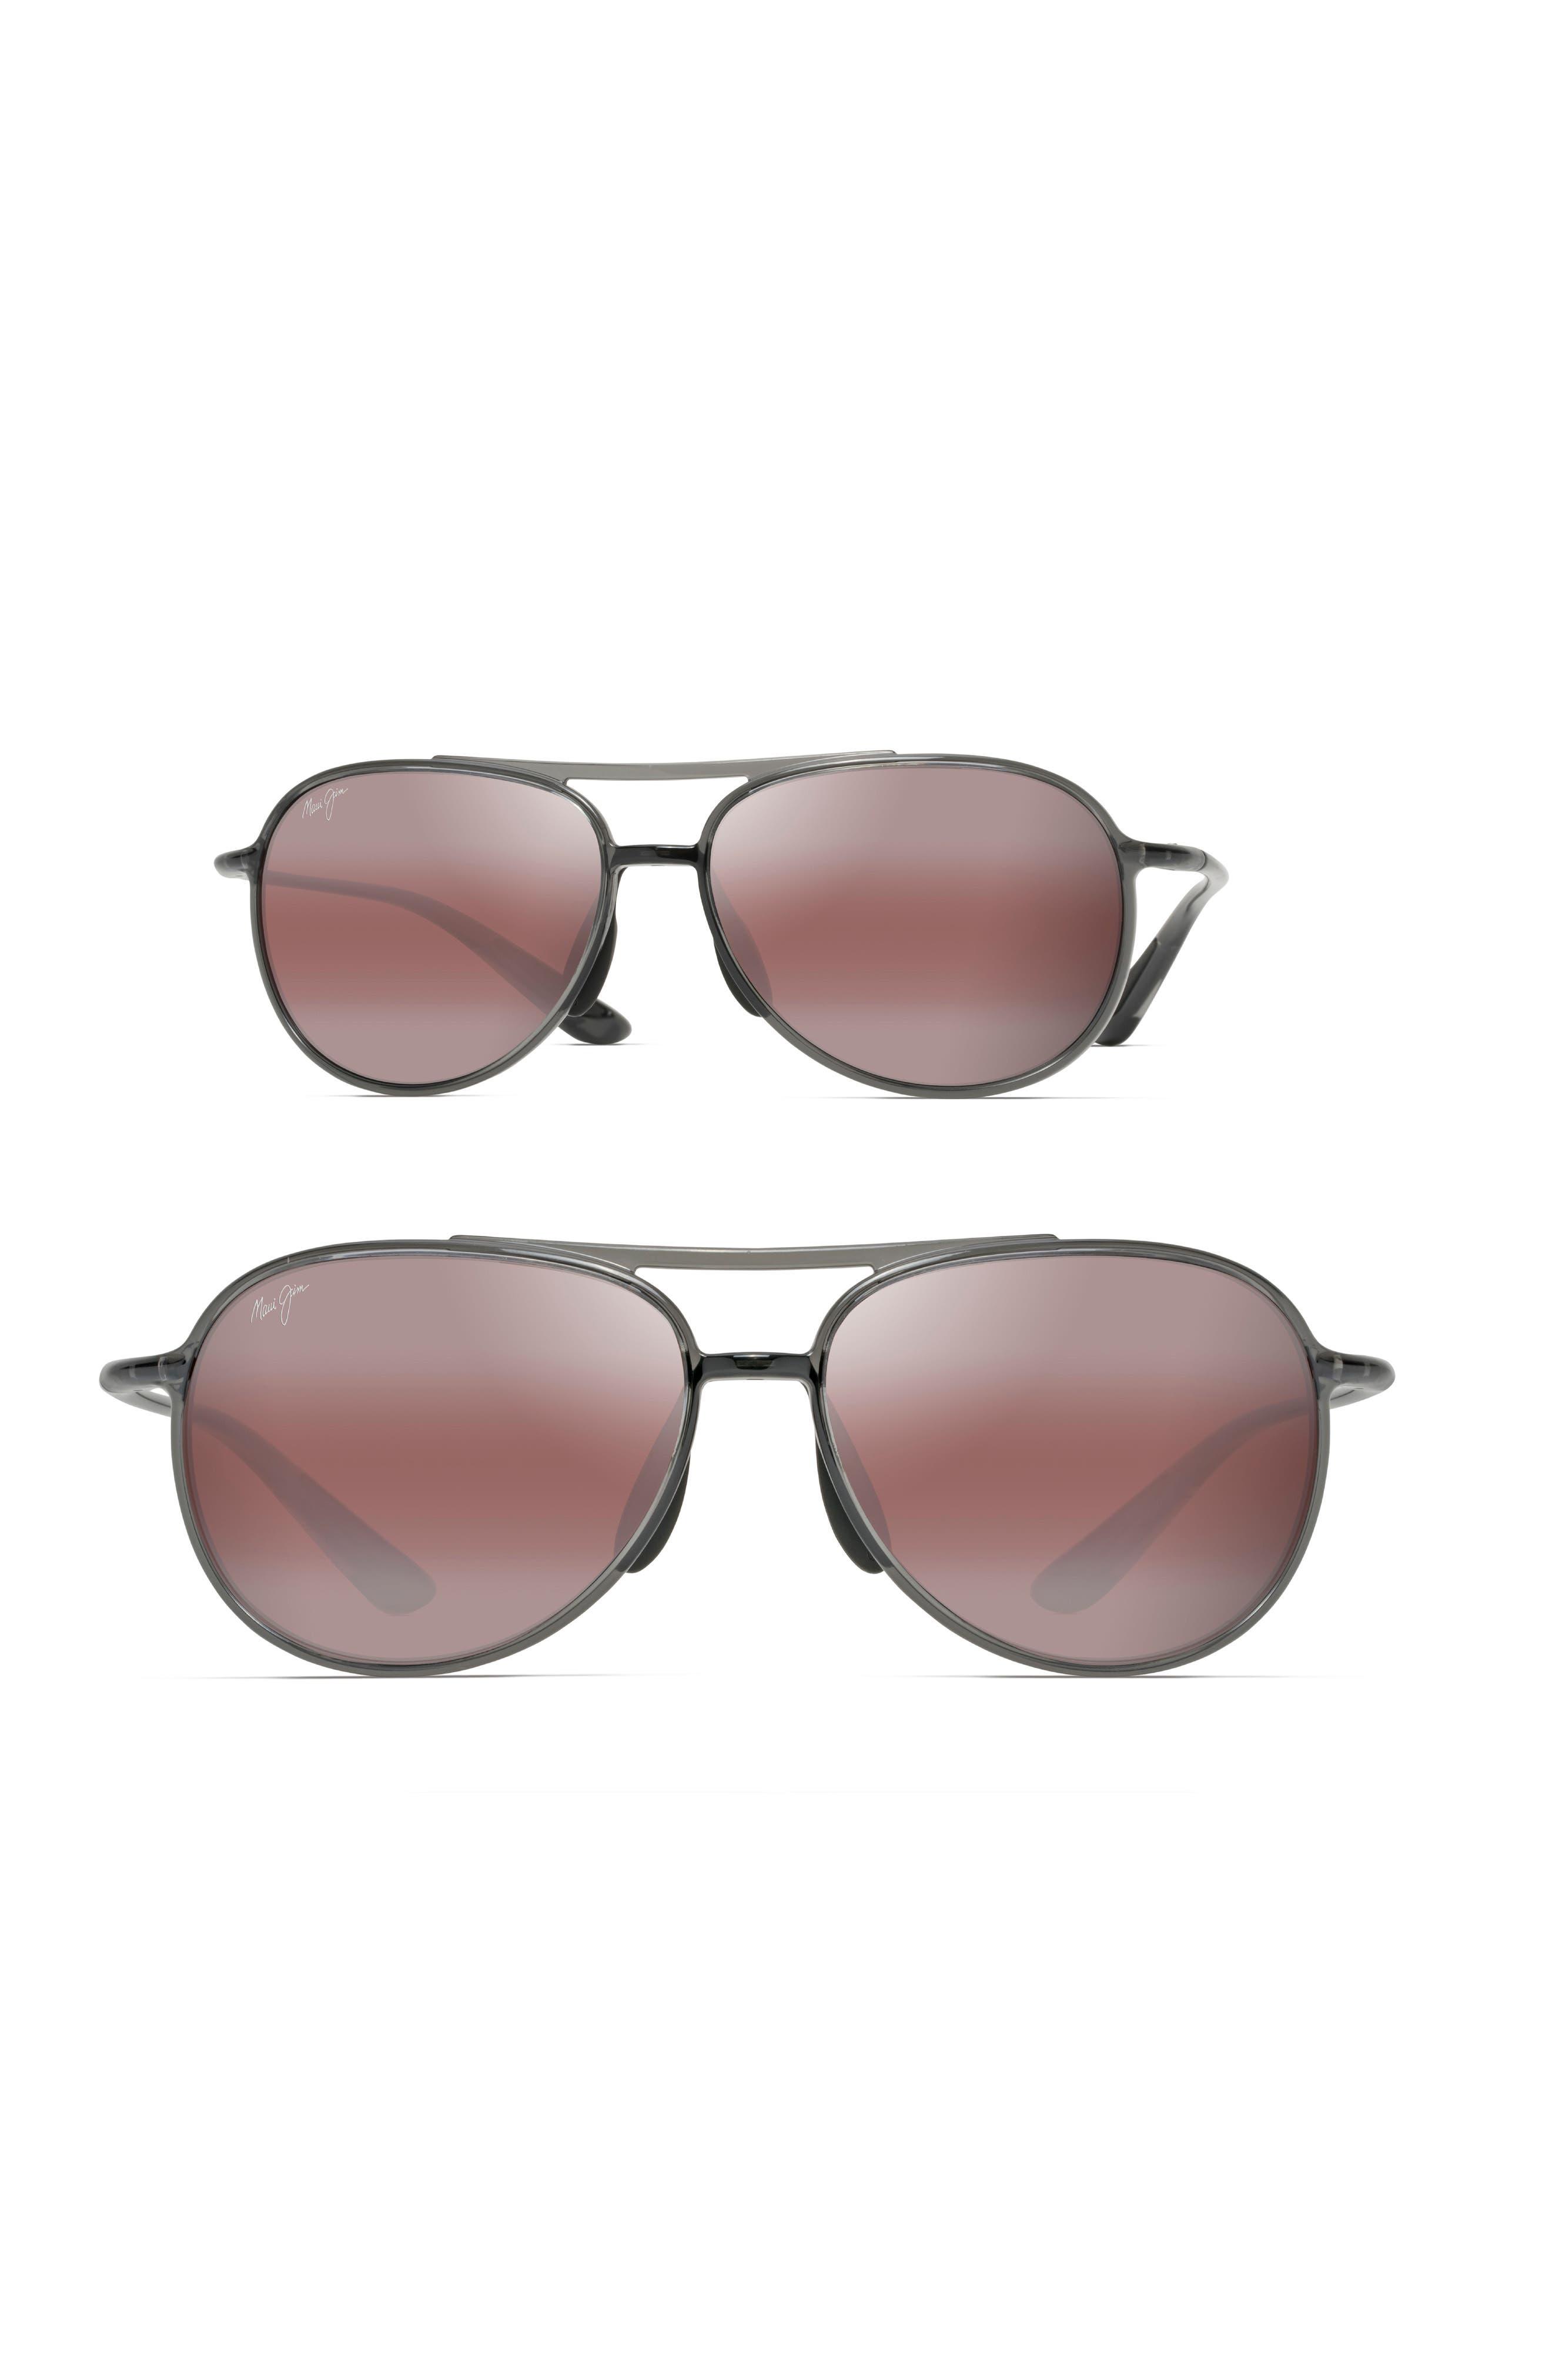 Alelele 60mm Aviator Sunglasses,                             Main thumbnail 1, color,                             TRANSPARENT SMOKE GREY/ BRONZE